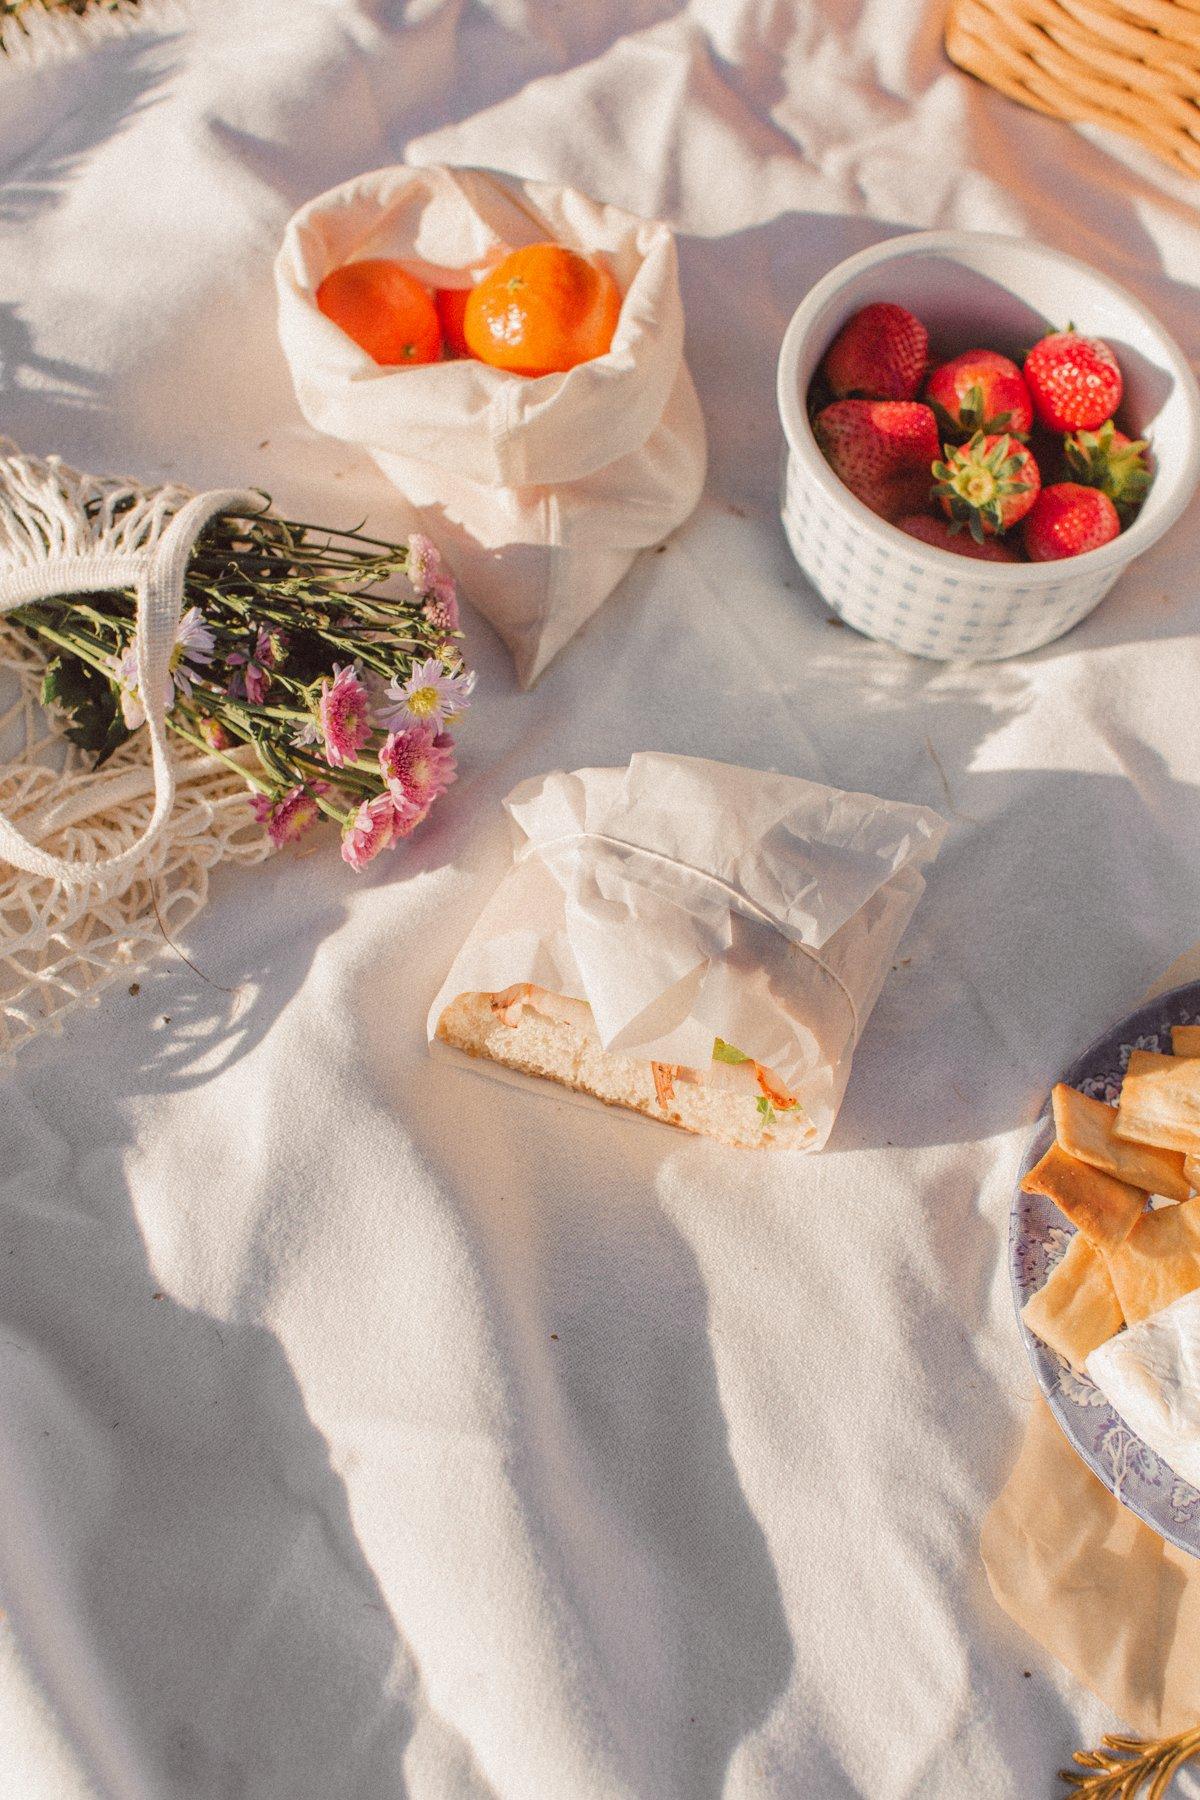 picnic food aesthetic